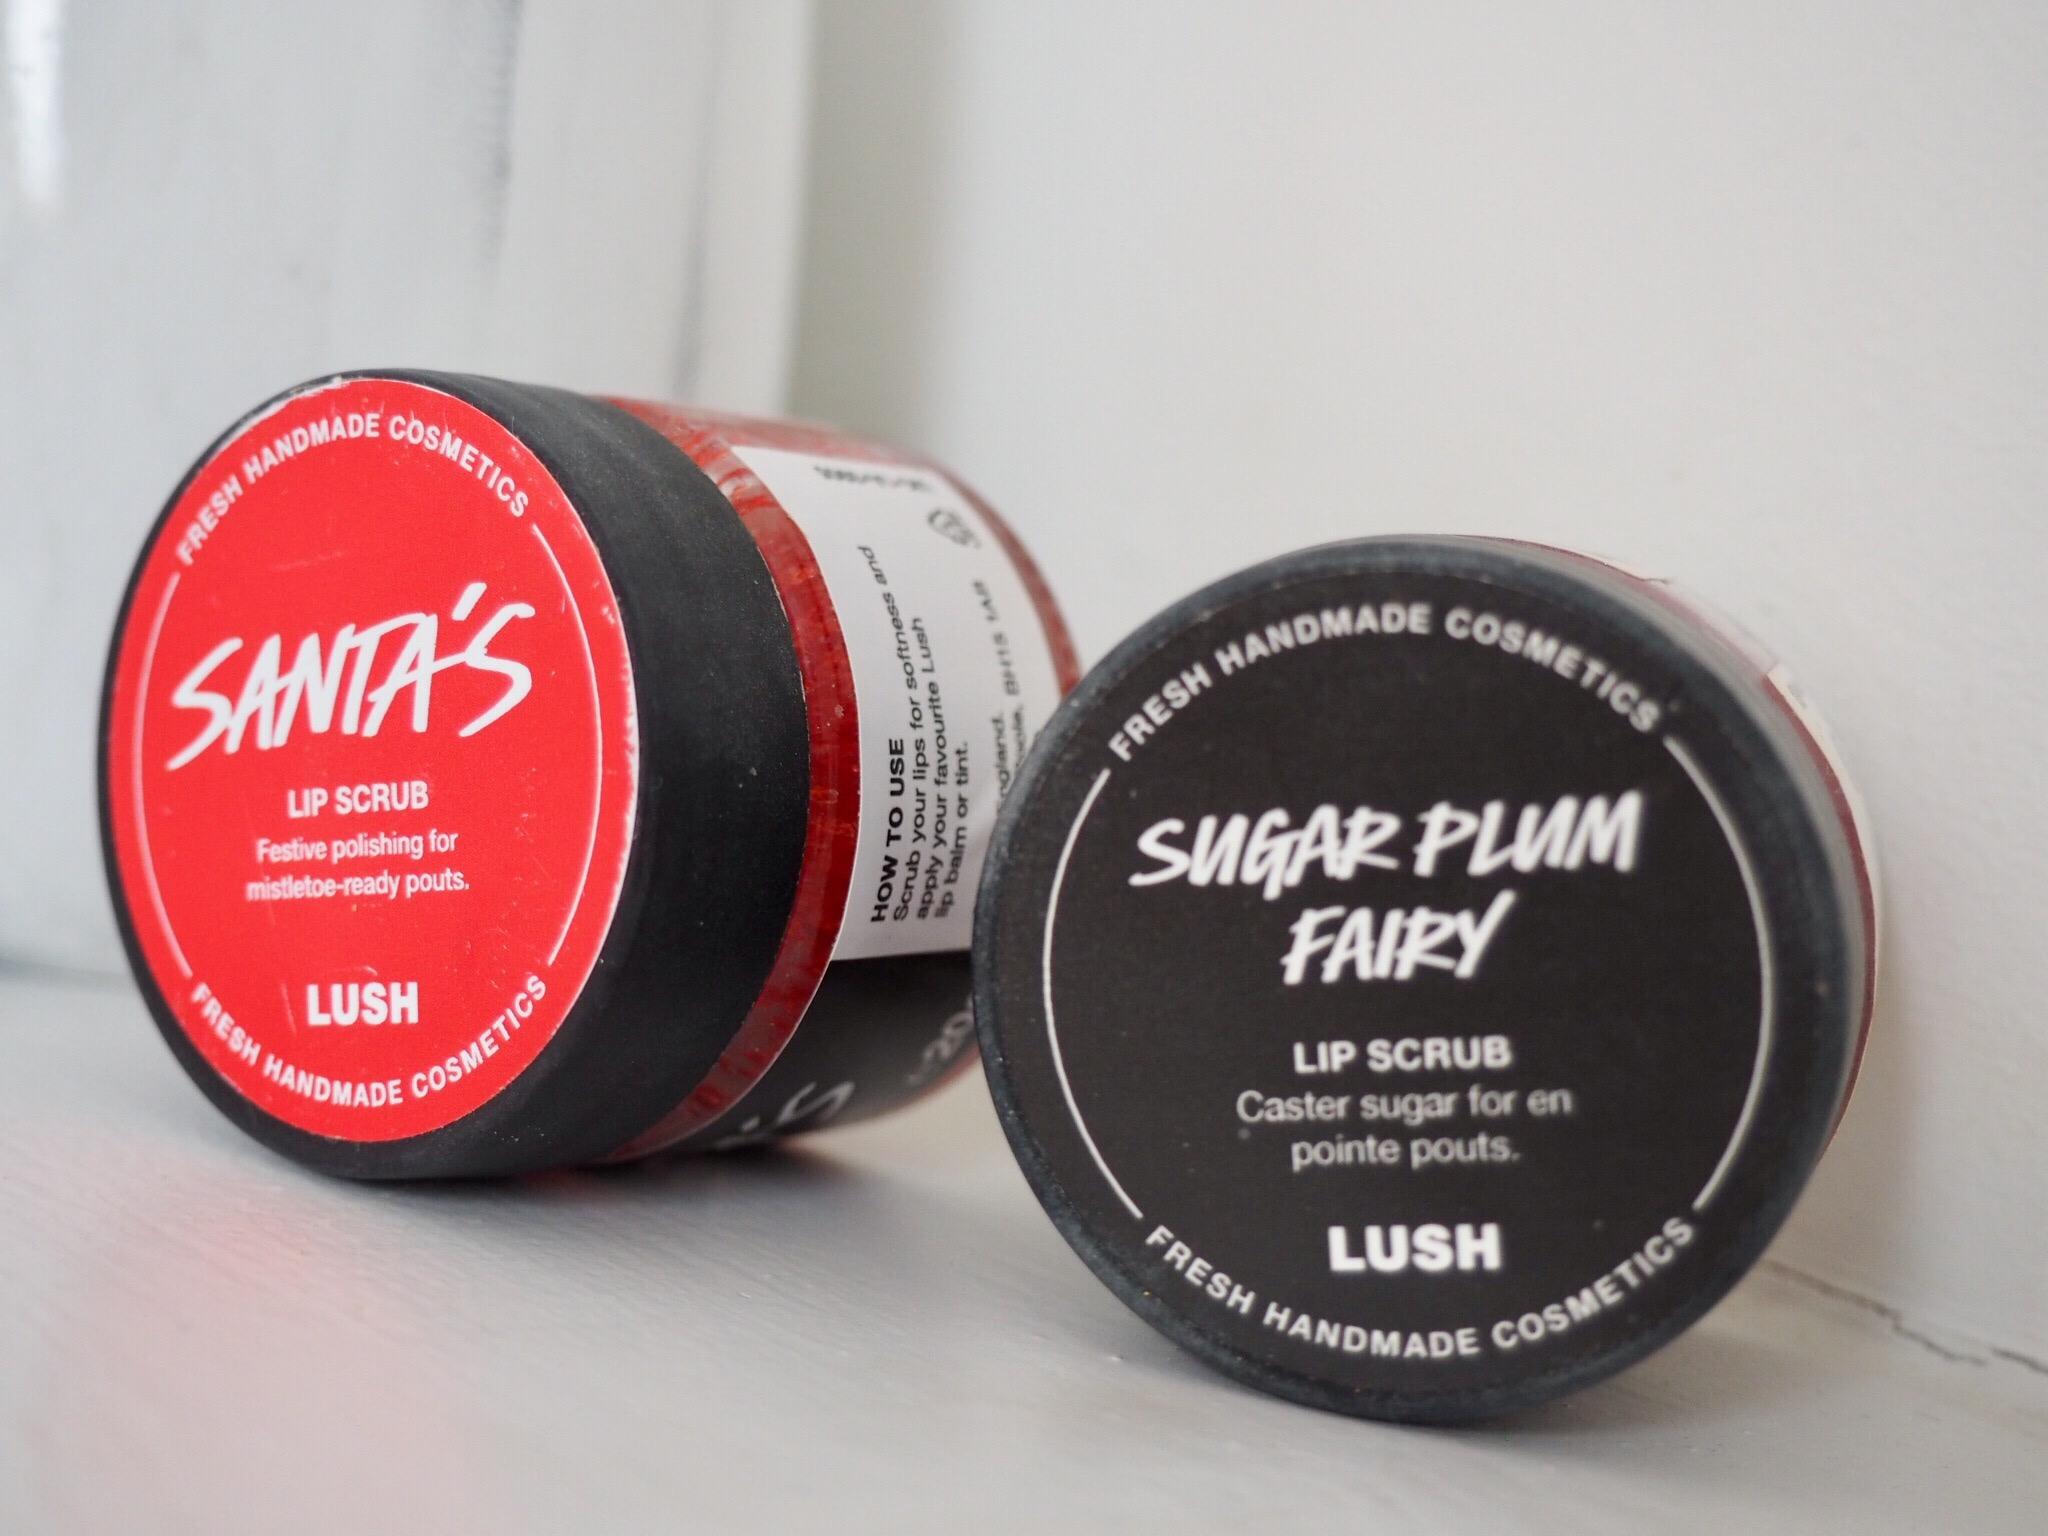 Lush Brand insight